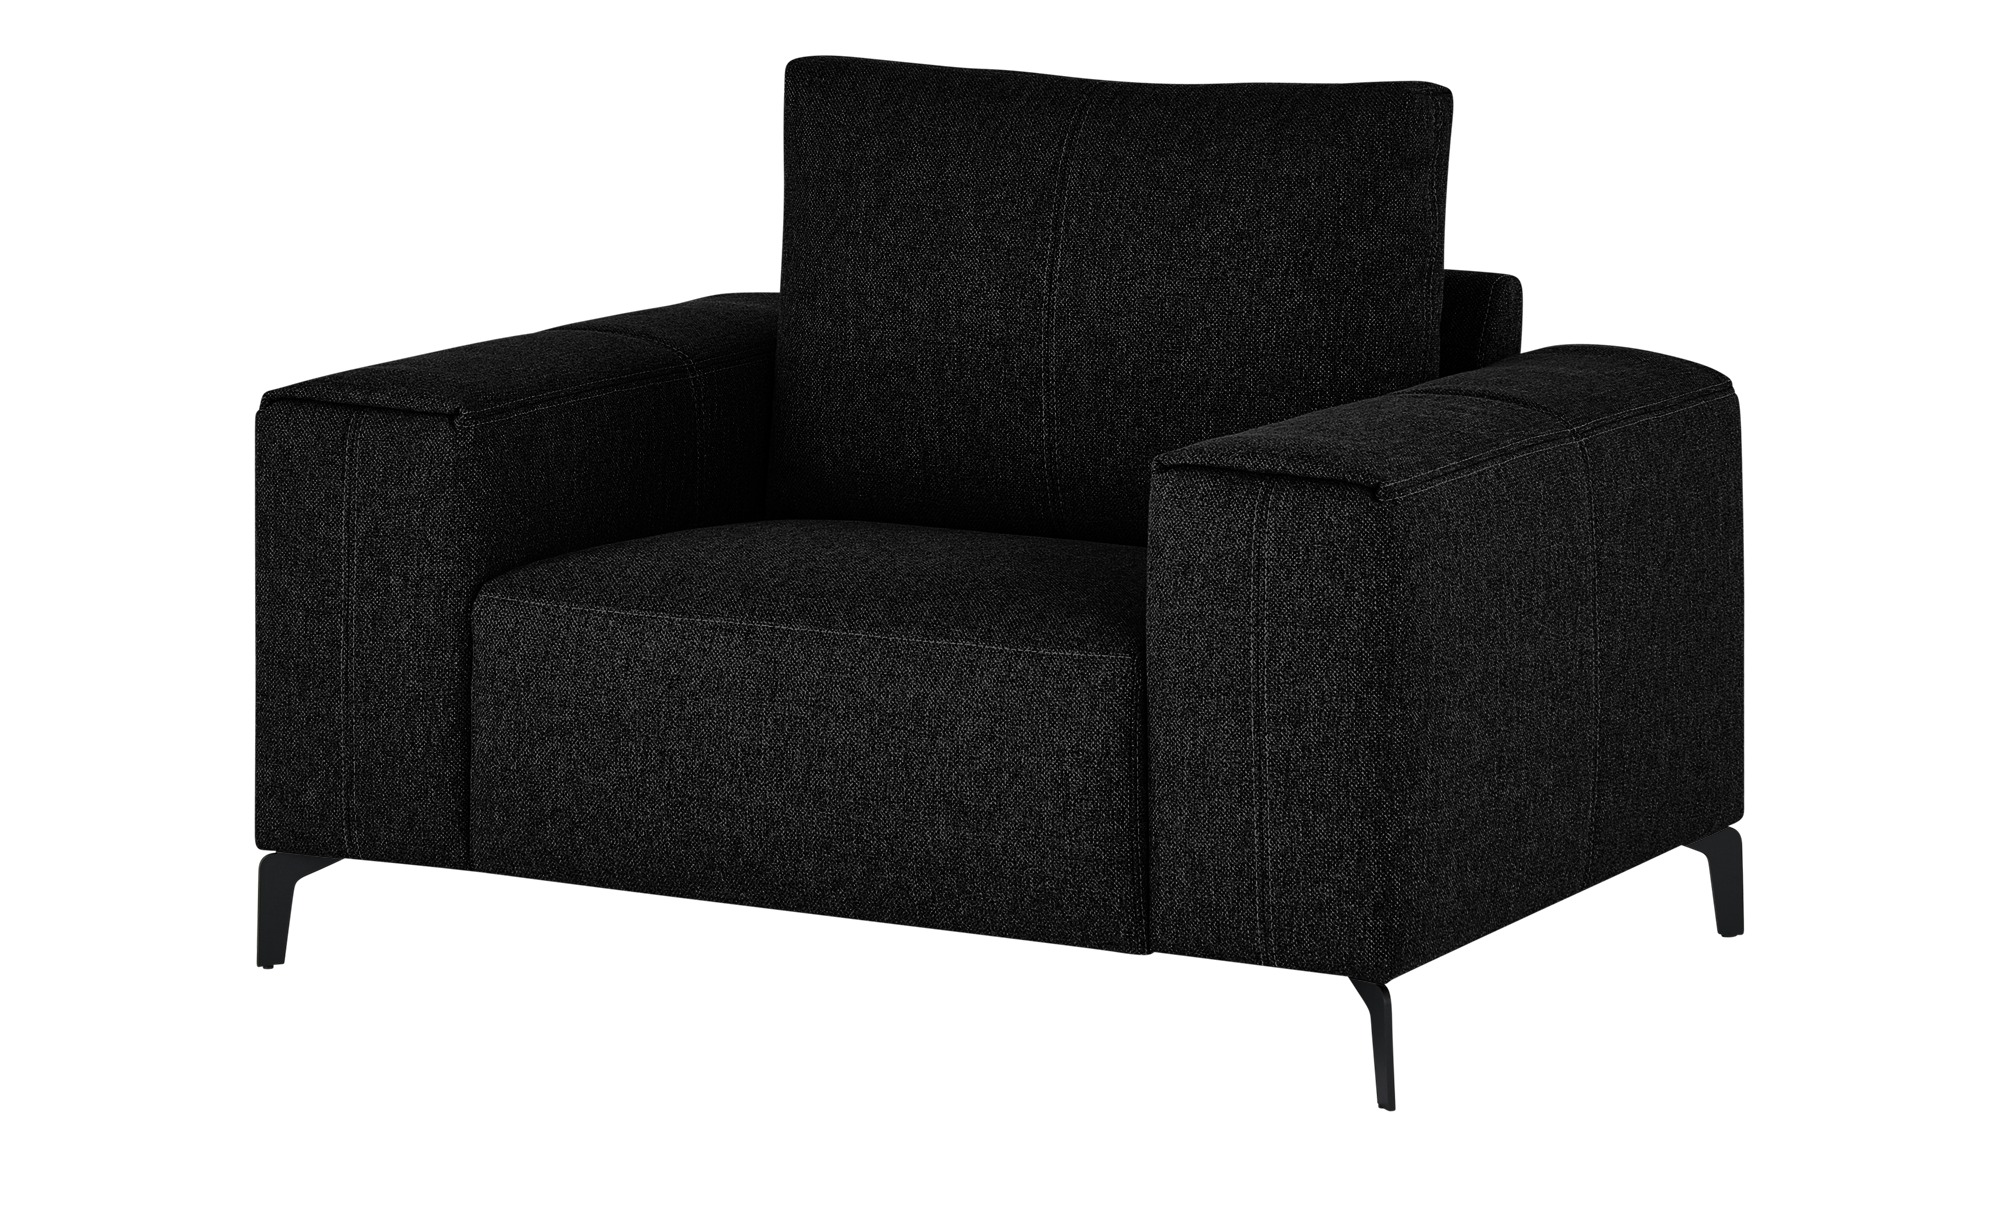 smart Sessel  Gabriela ¦ schwarz ¦ Maße (cm): B: 127 H: 90 T: 91 Polstermöbel > Sessel > Polstersessel - Höffner